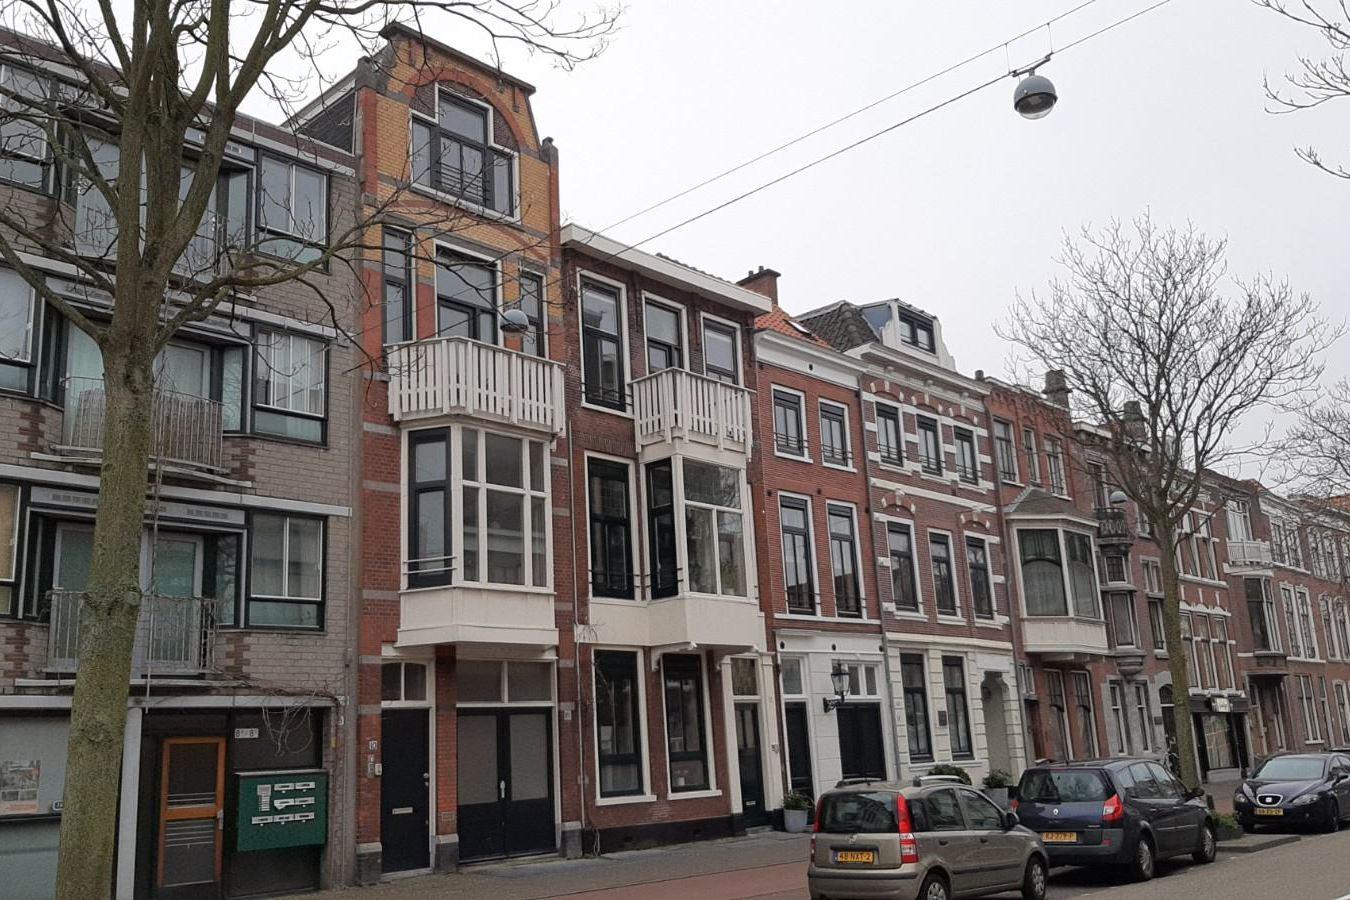 View photo 2 of Stille Veerkade 10